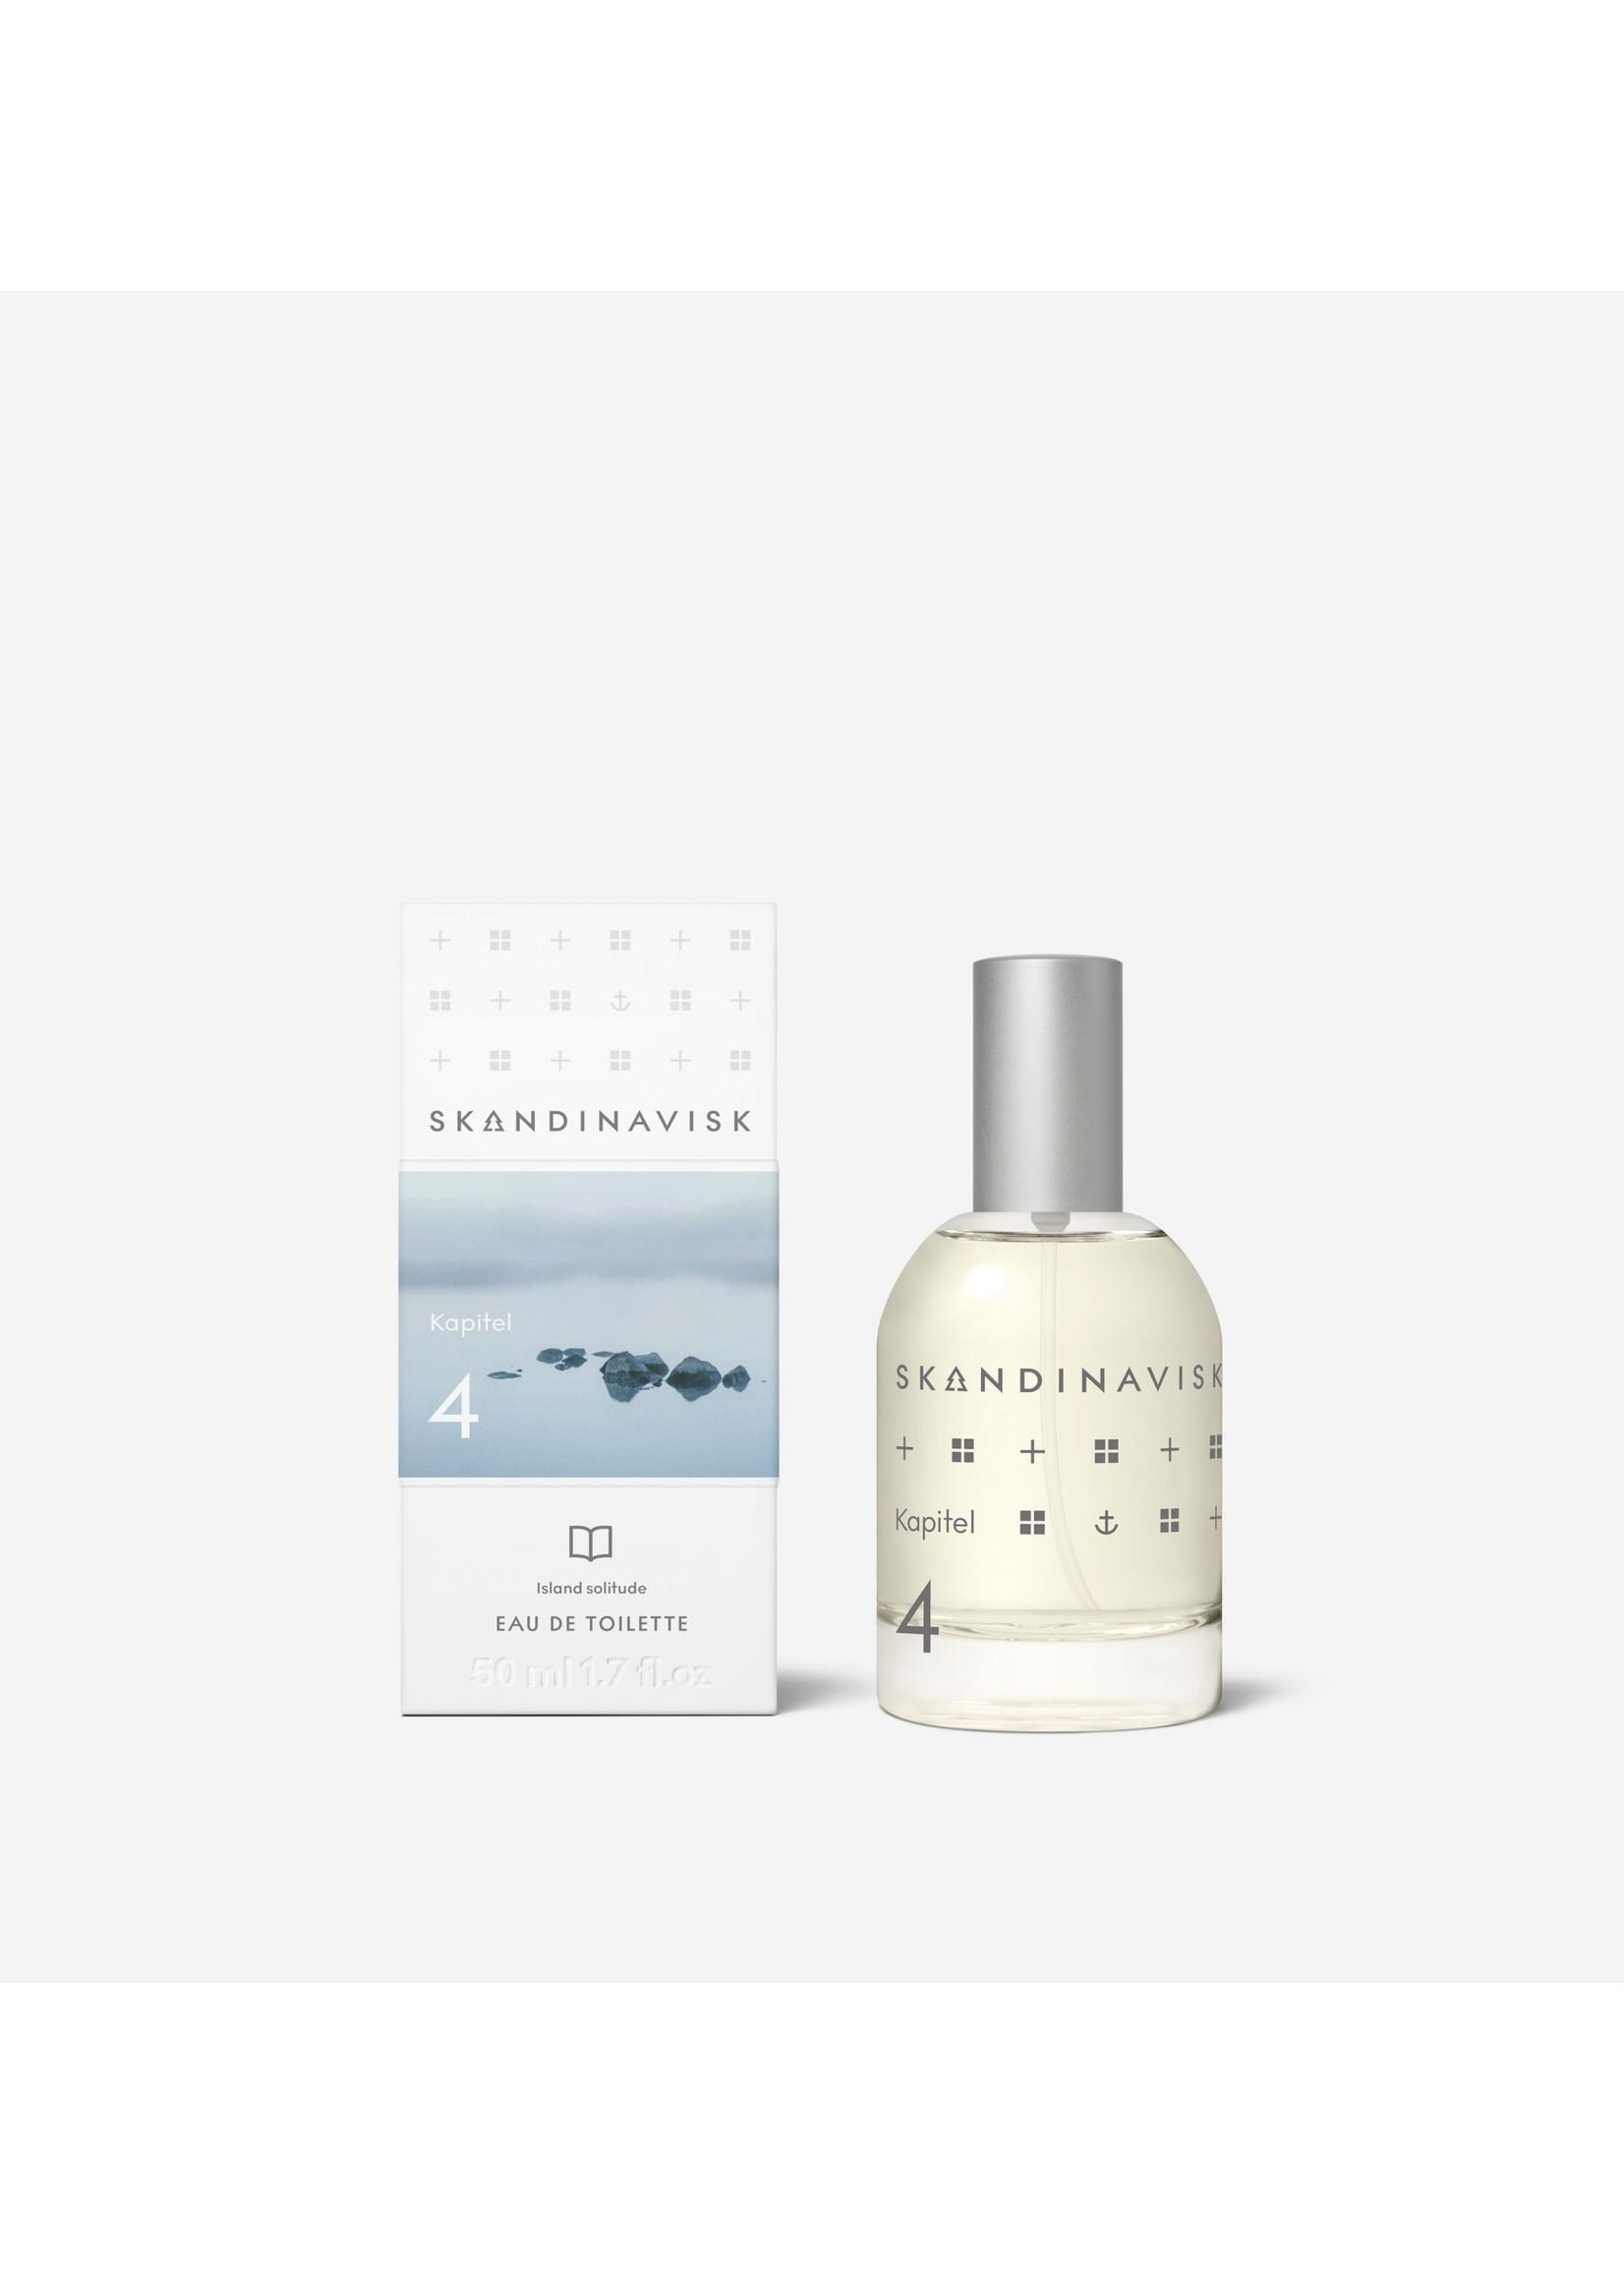 SKANDINAVISK Skandinavisk Eau de Toilette CHAPTER 4 -Island Solitude 50ml